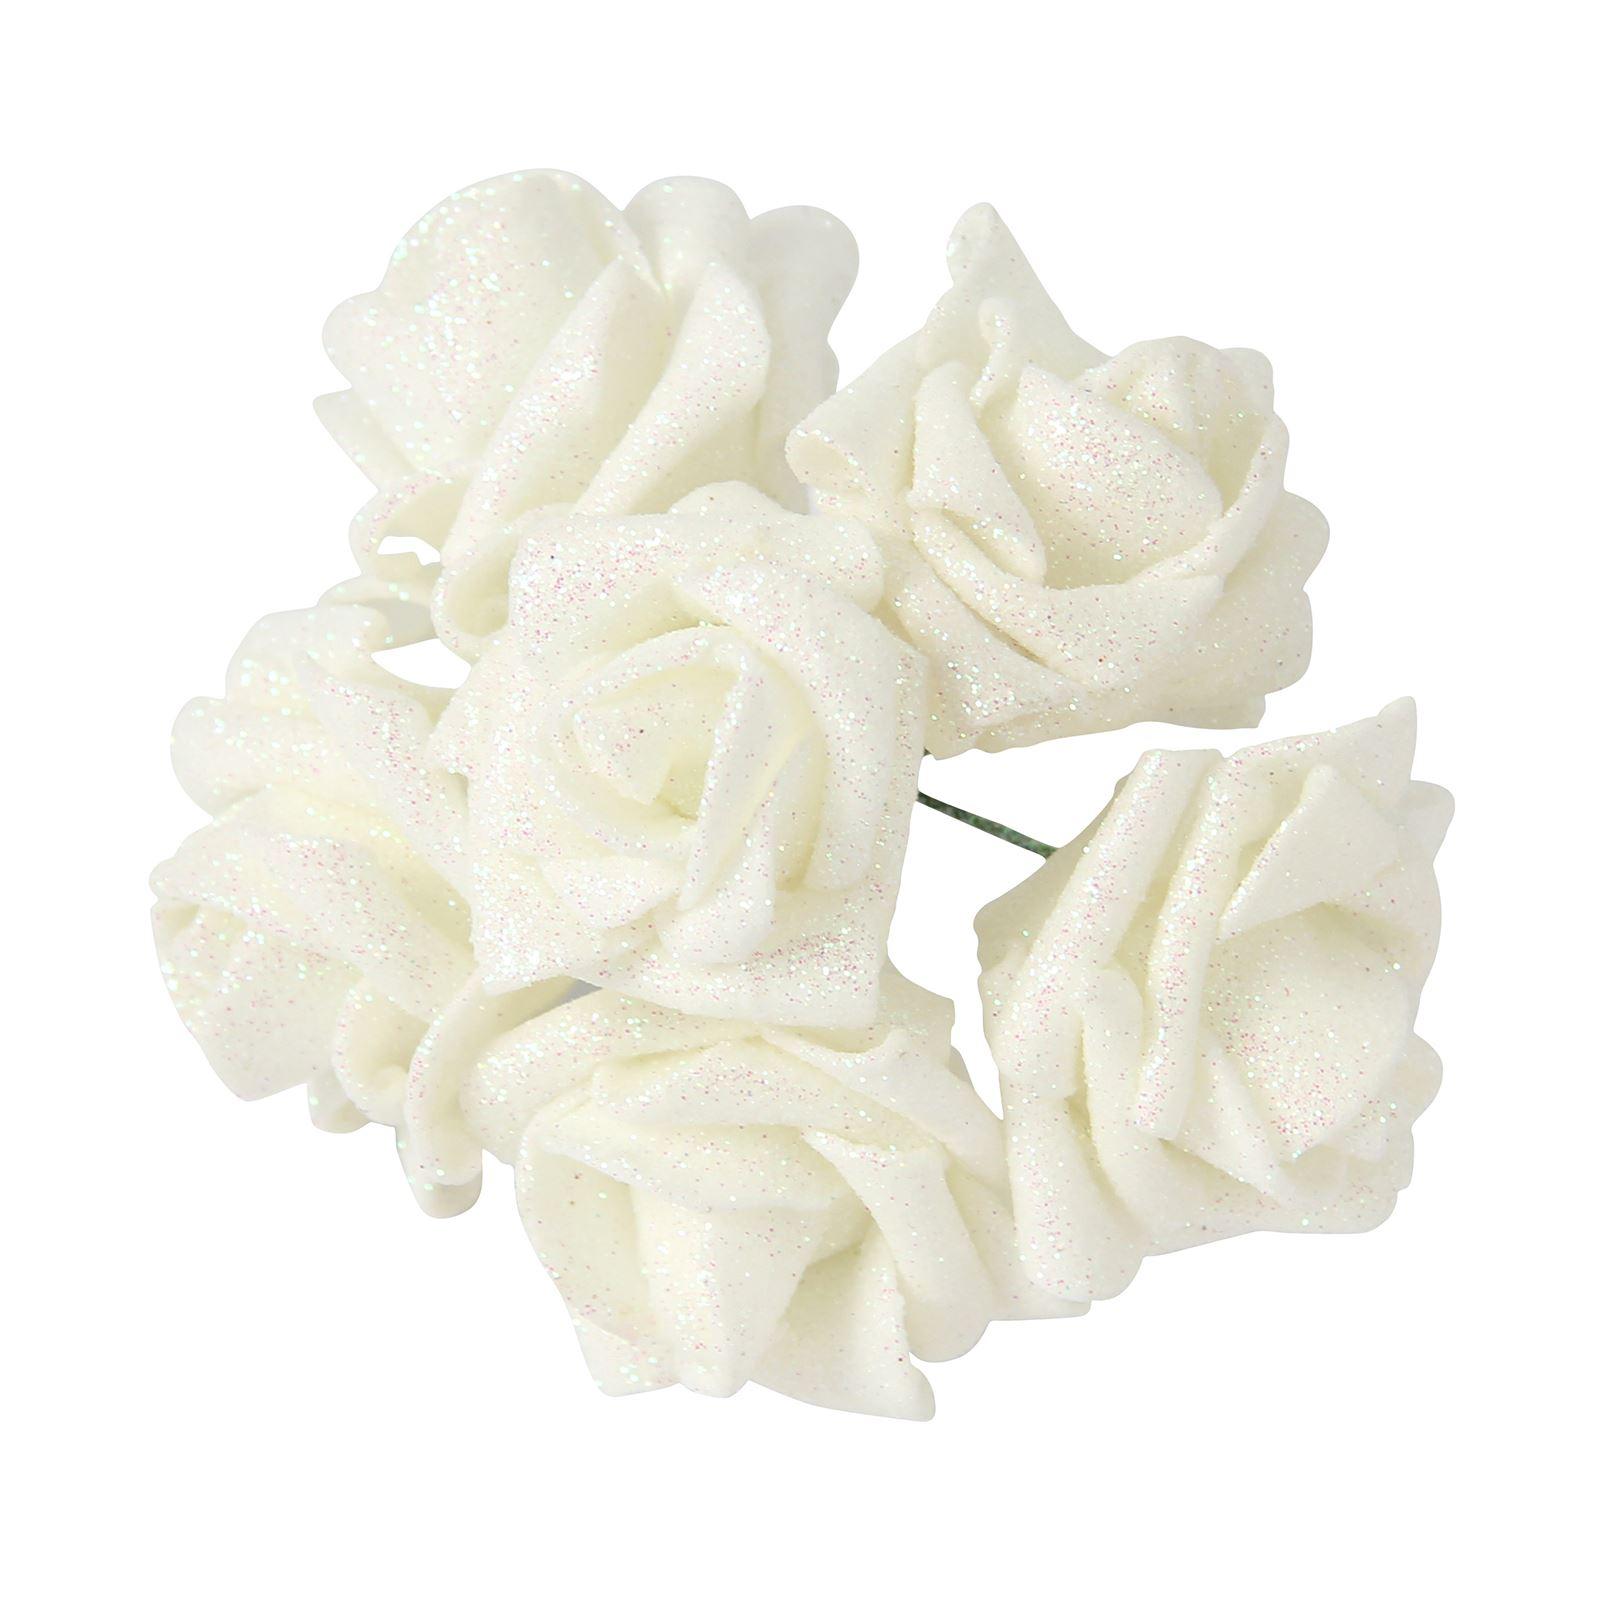 36x full glittered foam roses bling artificial glitter fake flowers picture 2 of 2 mightylinksfo